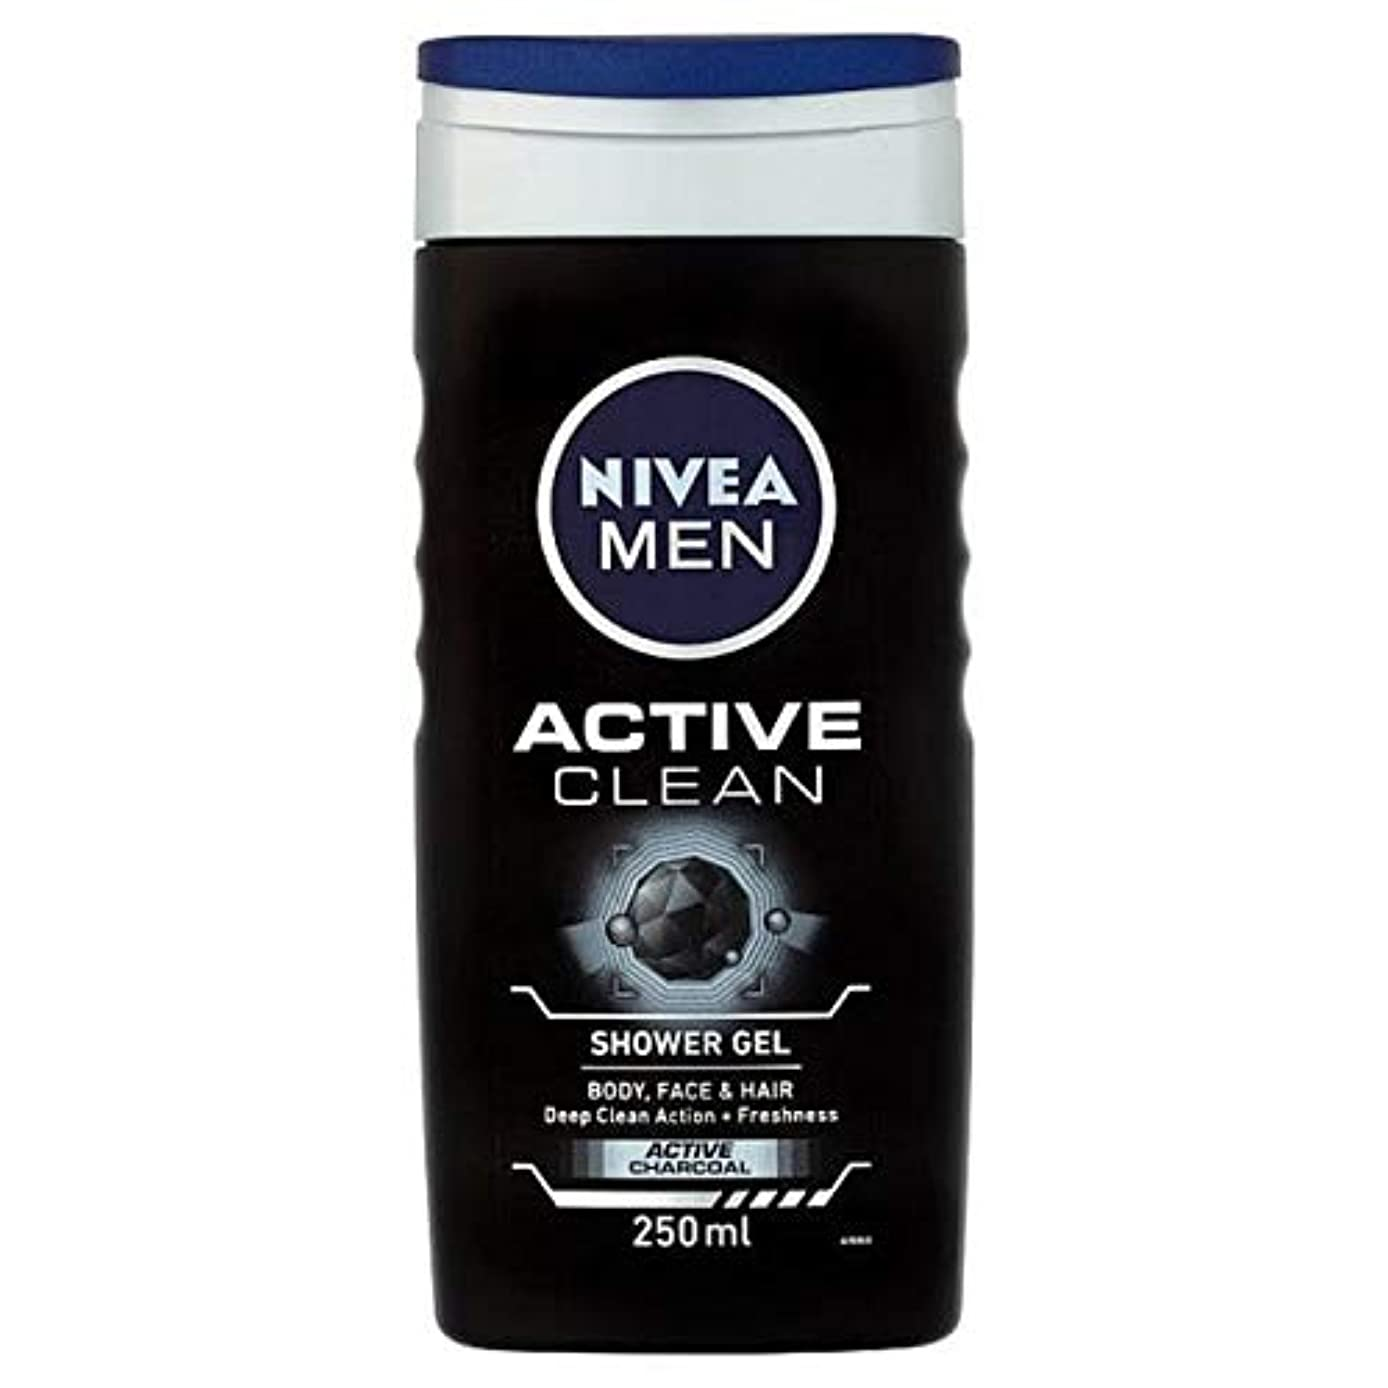 [Nivea ] ニベア男性用シャワージェル、炭との活発なきれいな、250ミリリットル - NIVEA Men Shower Gel, Active Clean with Charcoal, 250ml [並行輸入品]